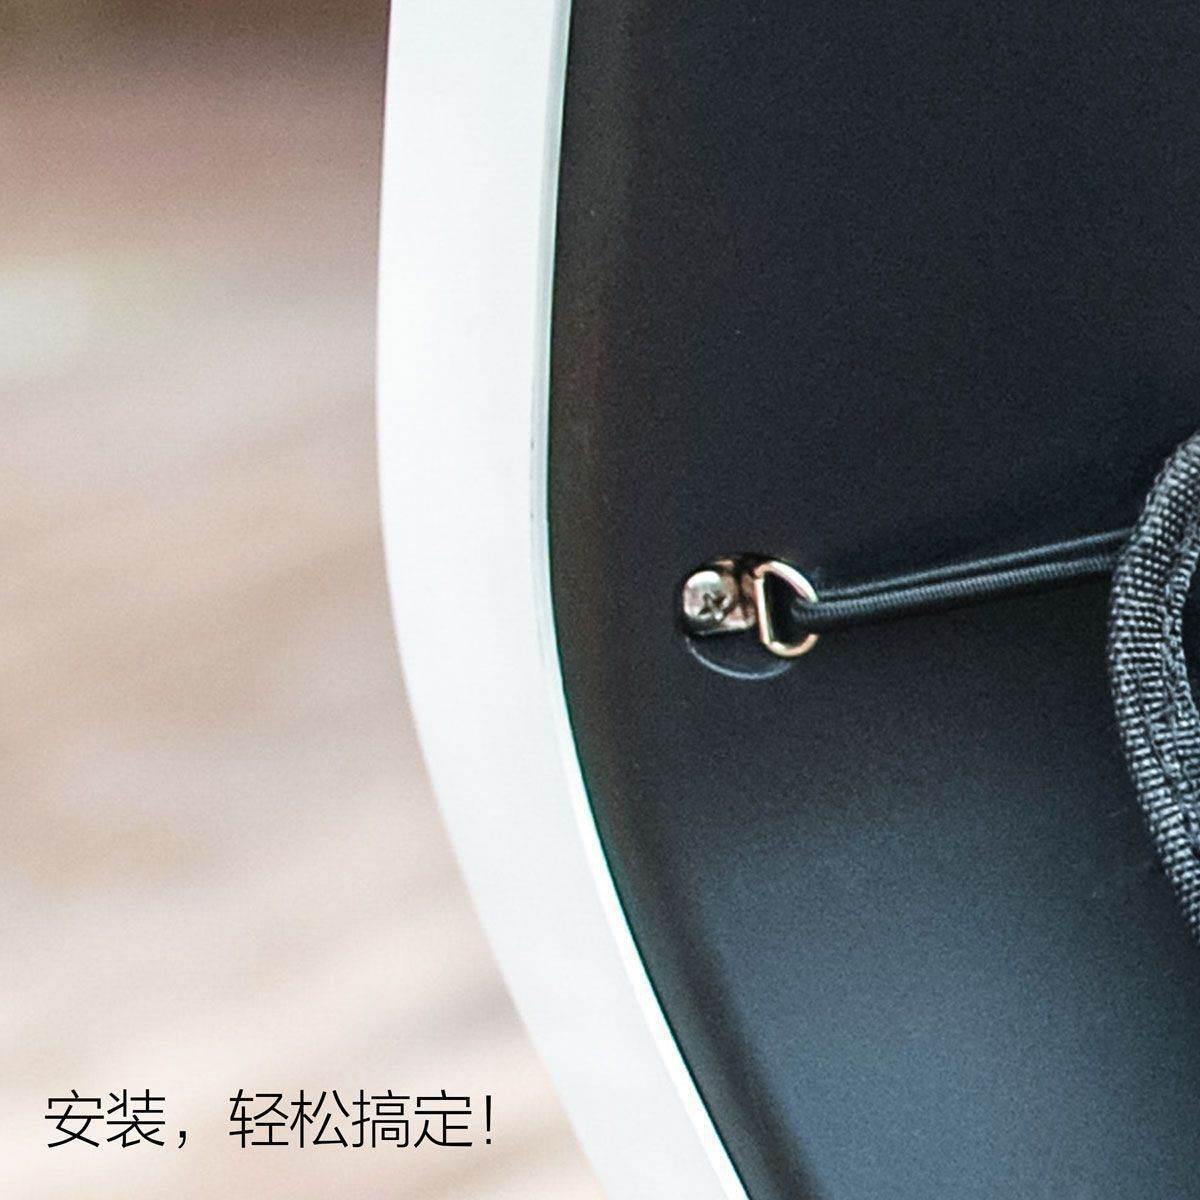 MO小牛M1/M+/U+/U1前置挂包电动车改装配件专用储物网兜置物收纳